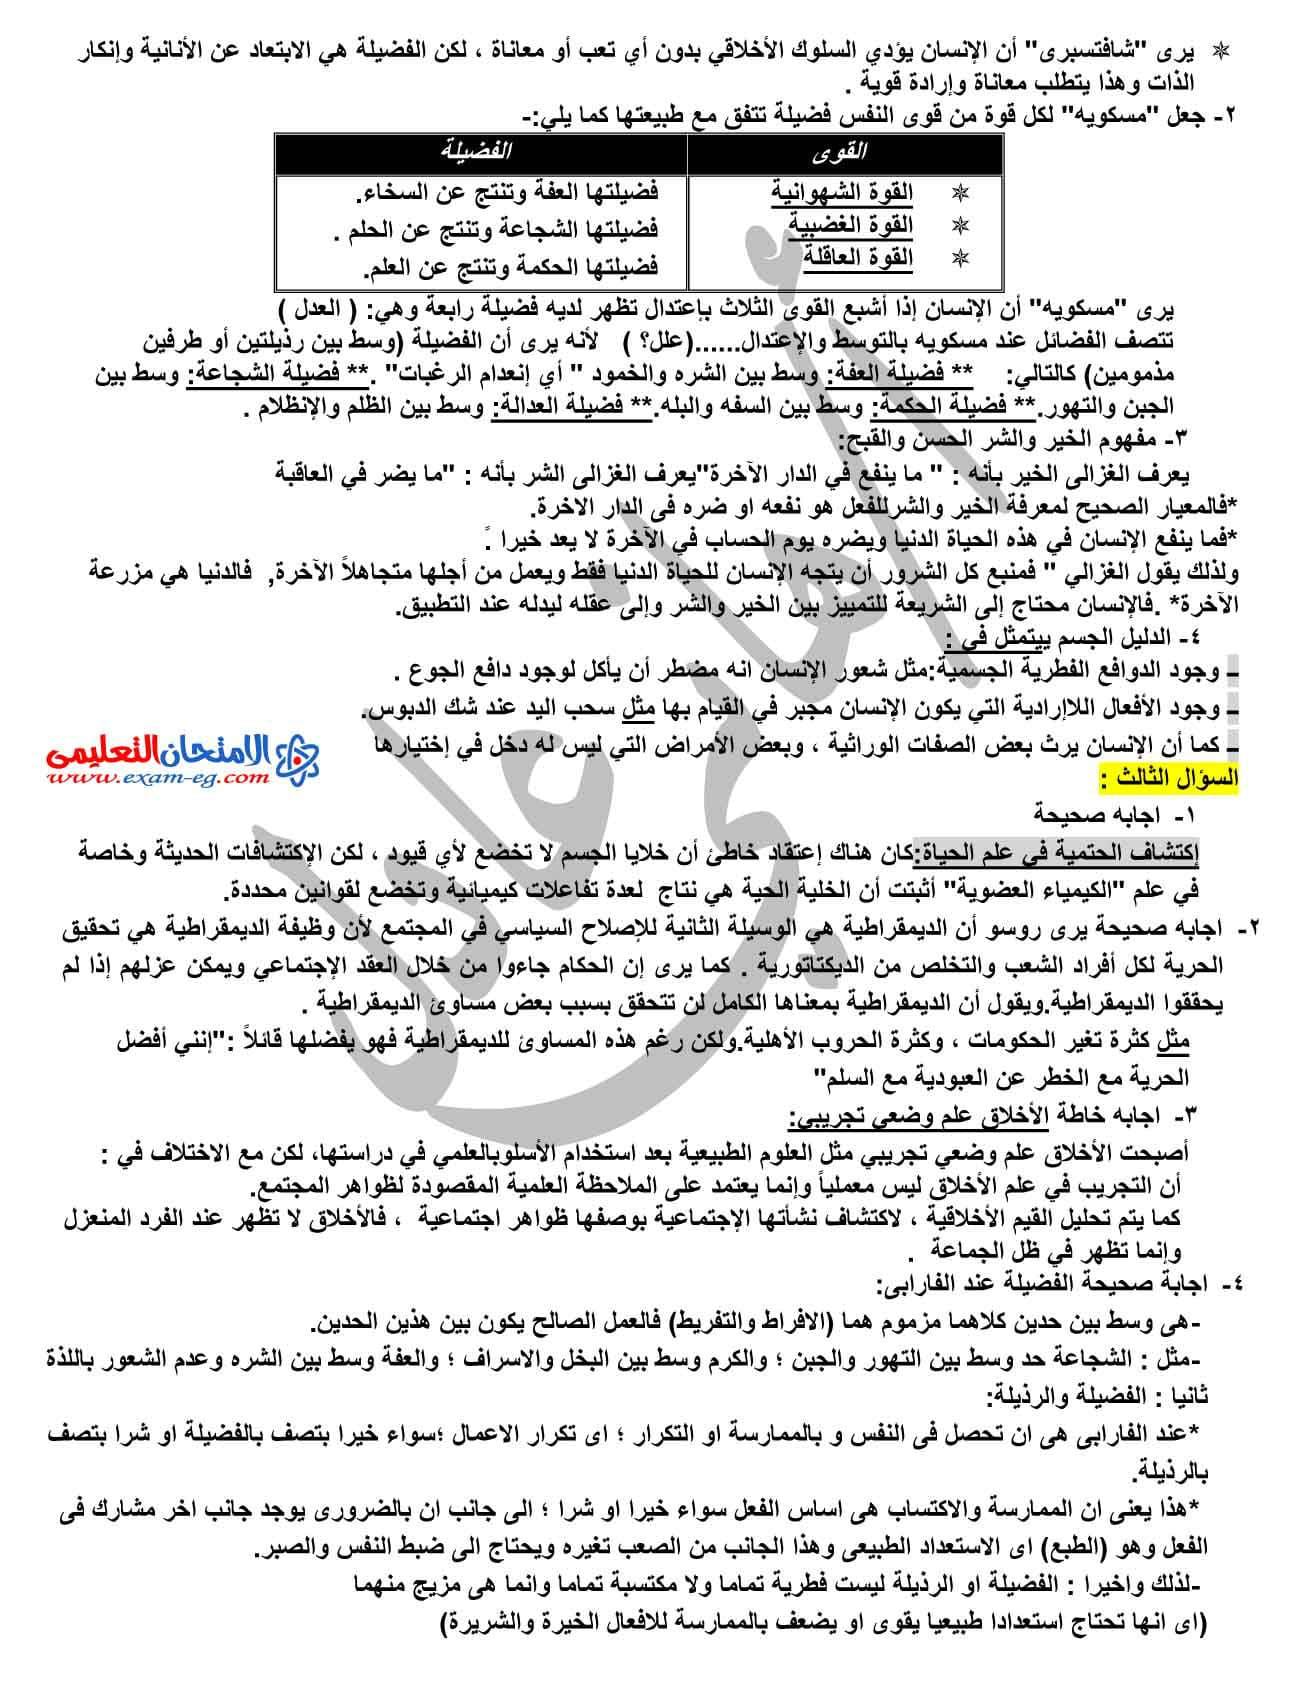 exam-eg.com_1434301219632.jpg